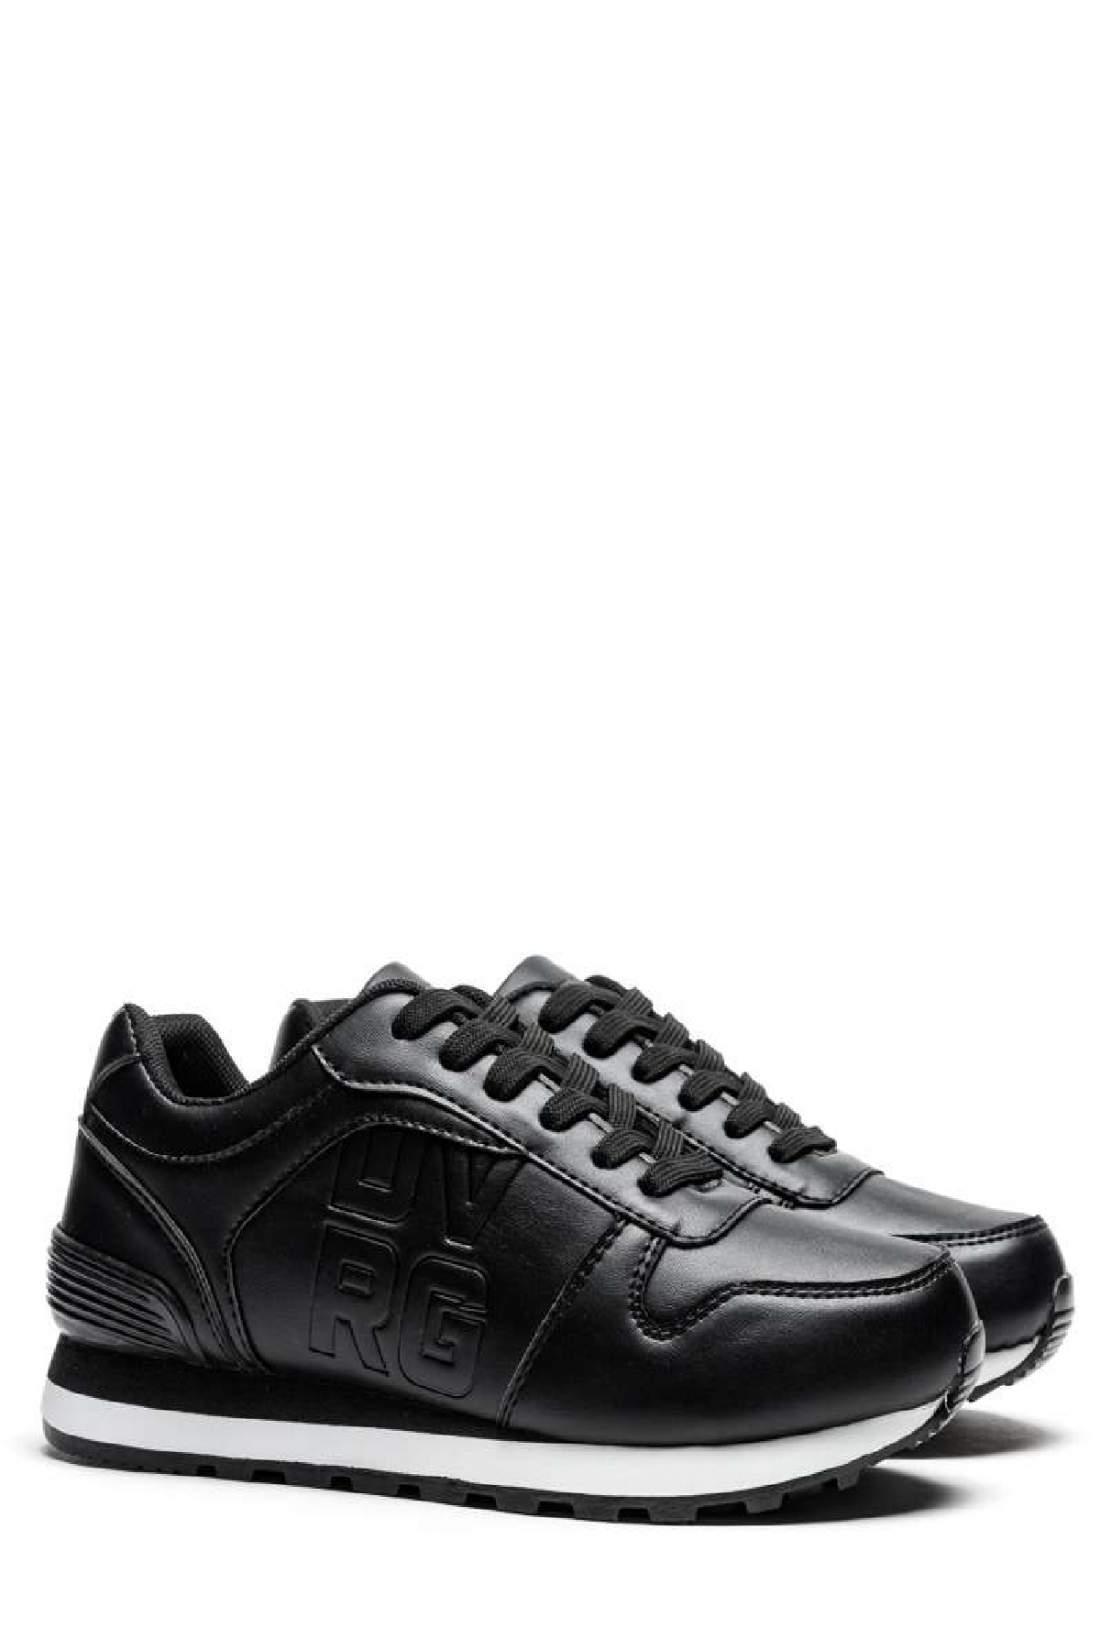 Devergo NIKA PU női sportcipő - Fekete